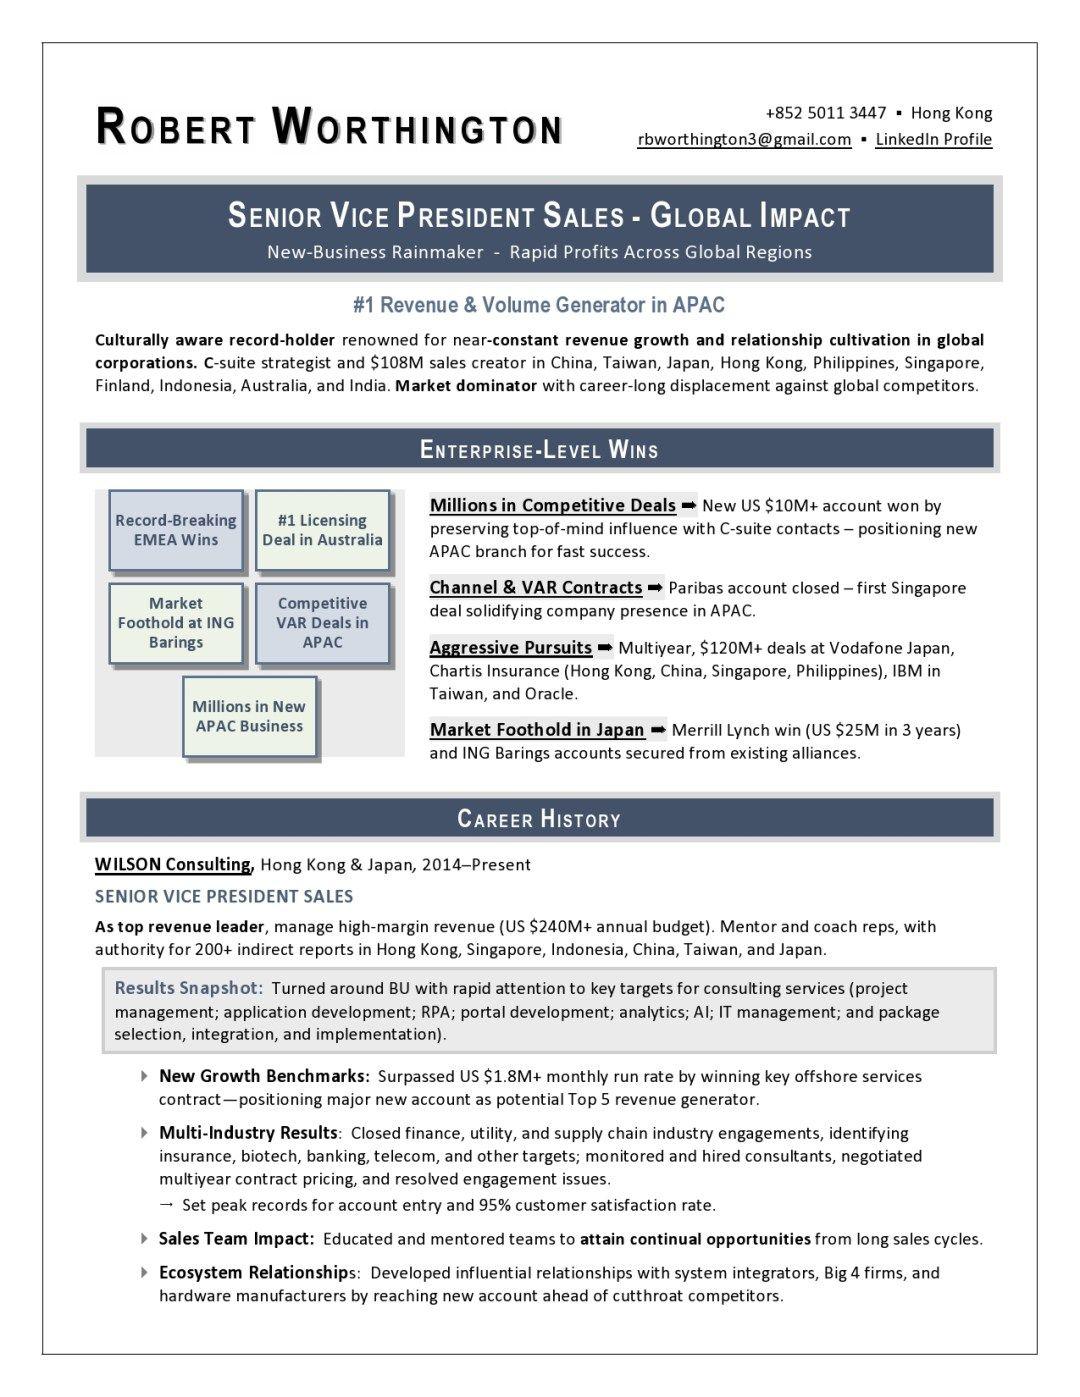 Sample Vp Sales Resume Sales Resume Resume Writing Services Resume Writing